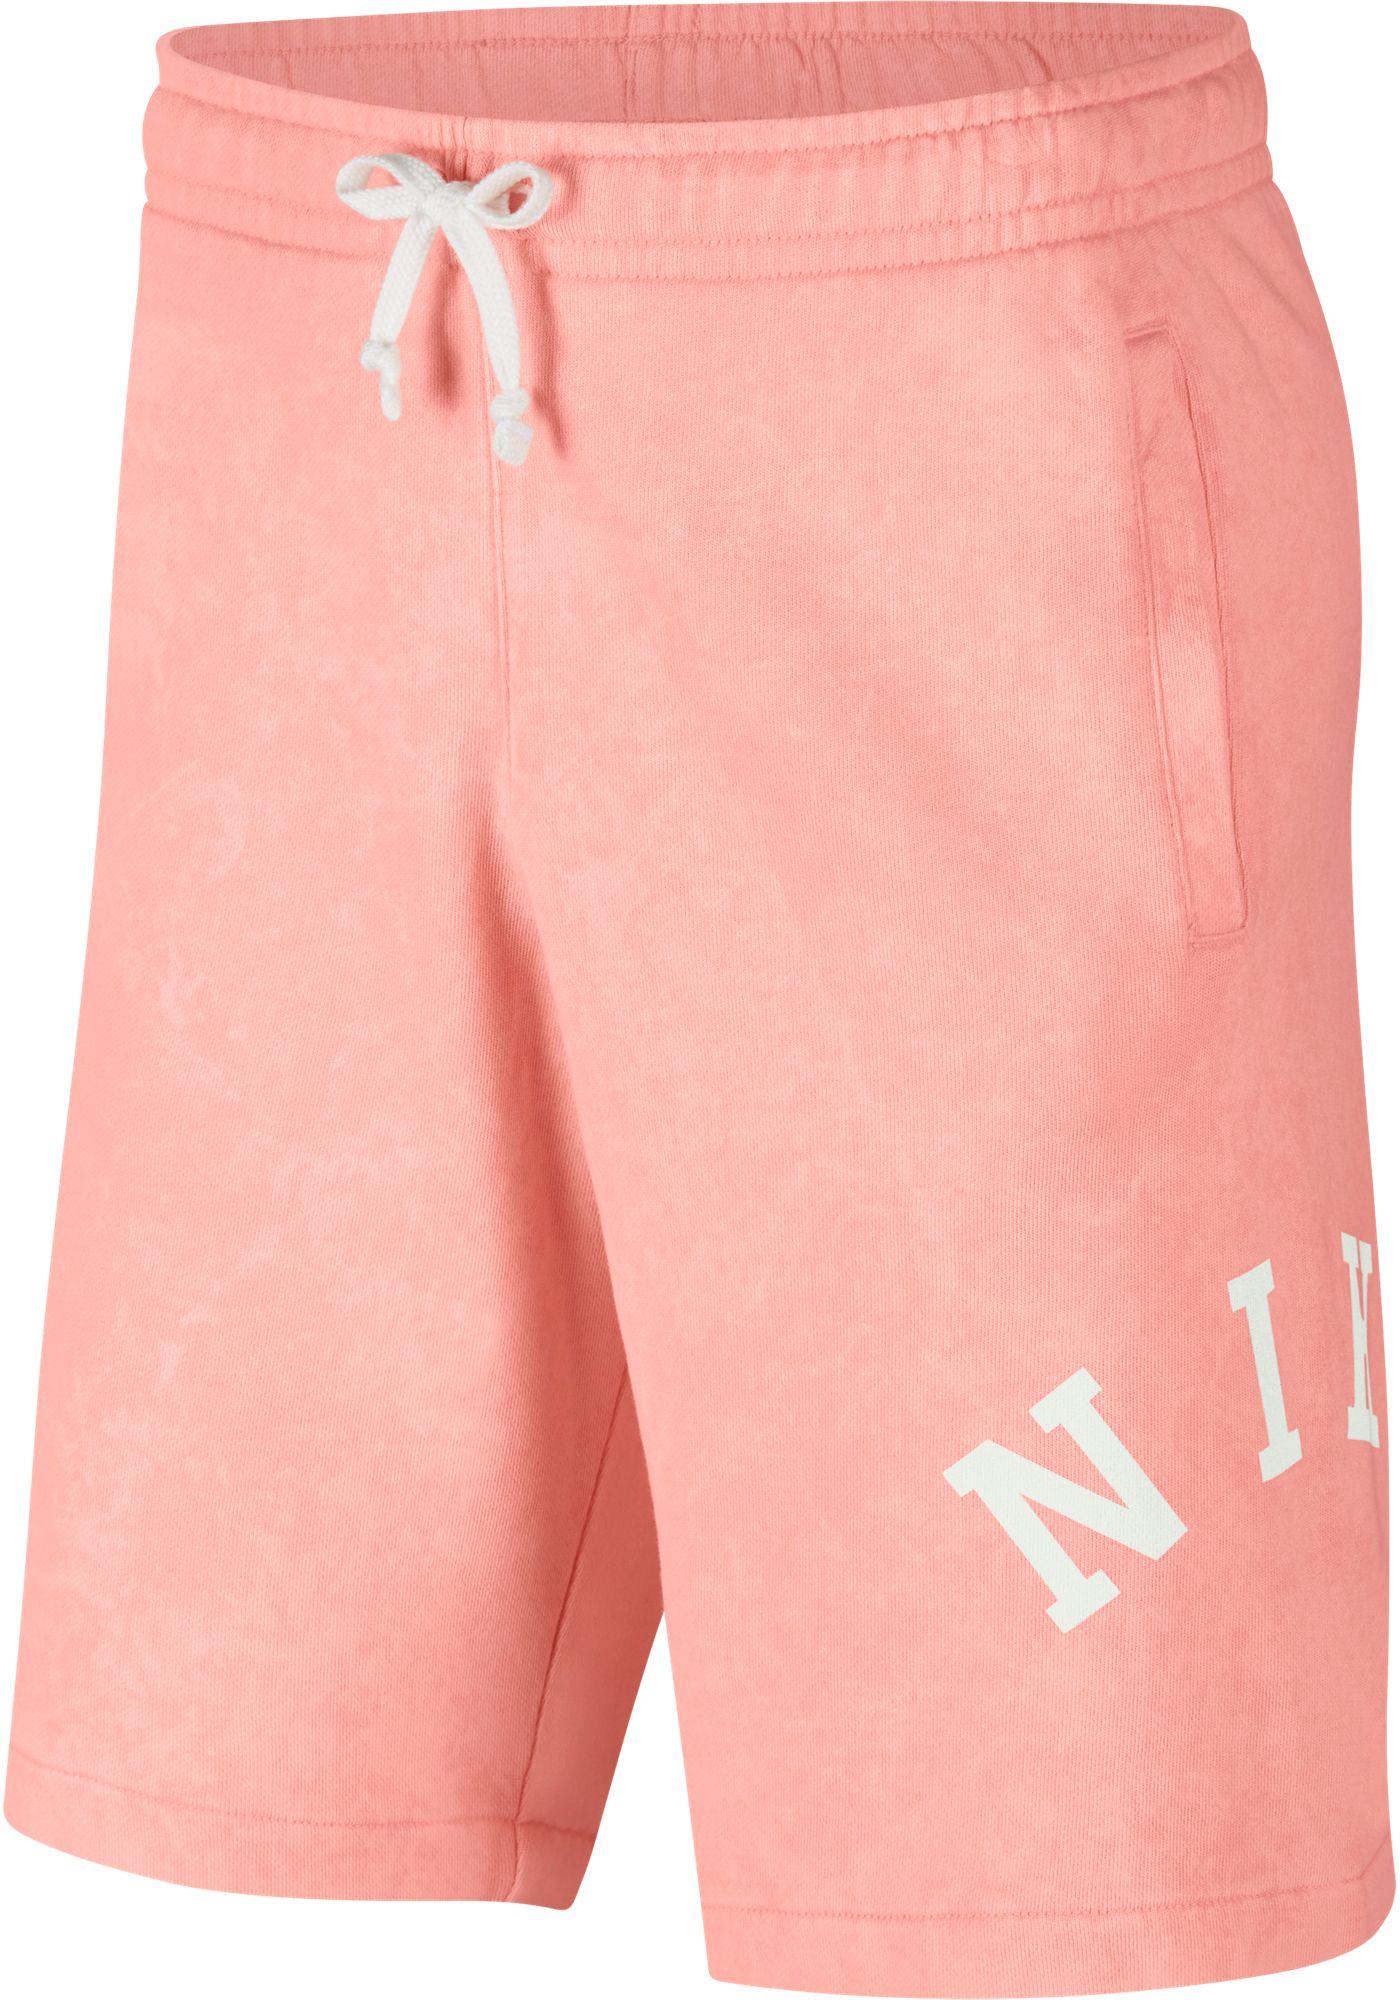 Nike Men's Sportswear French Terry Wash Shorts